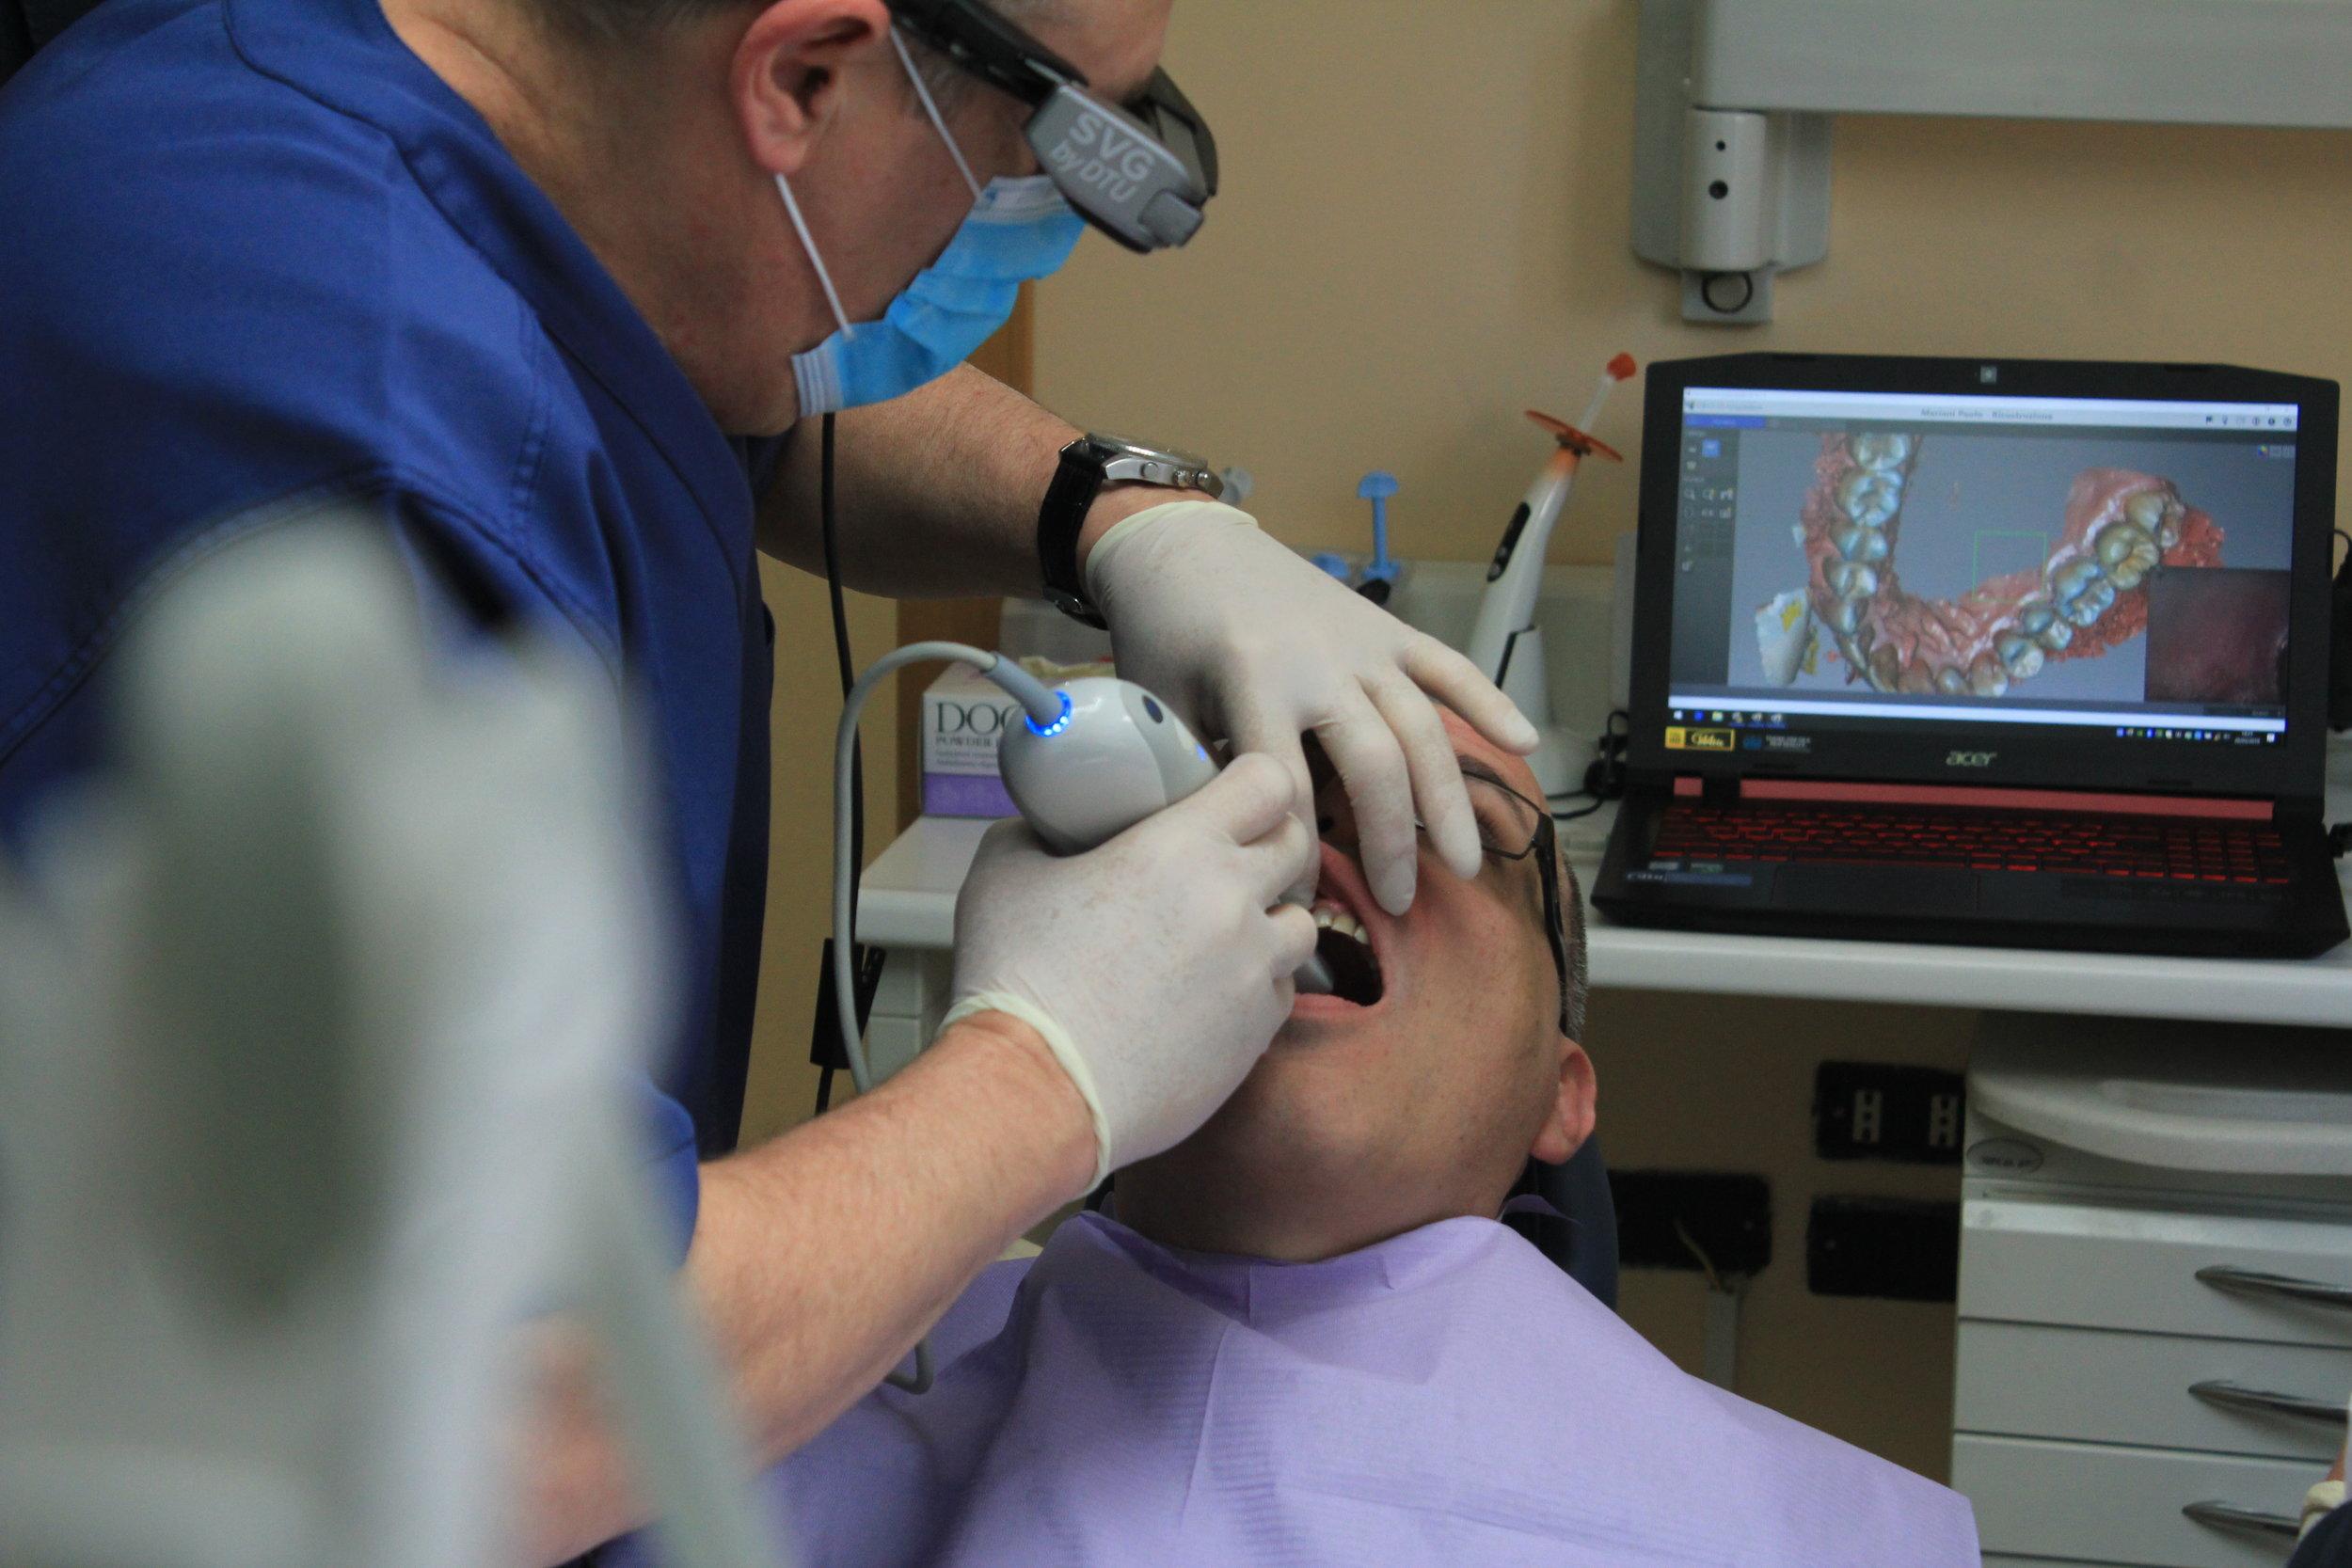 ELLESMERE DENTAL CARE TEAM - Meet with Dr. A. Kaykin and Ellesmere Dental Care Team.